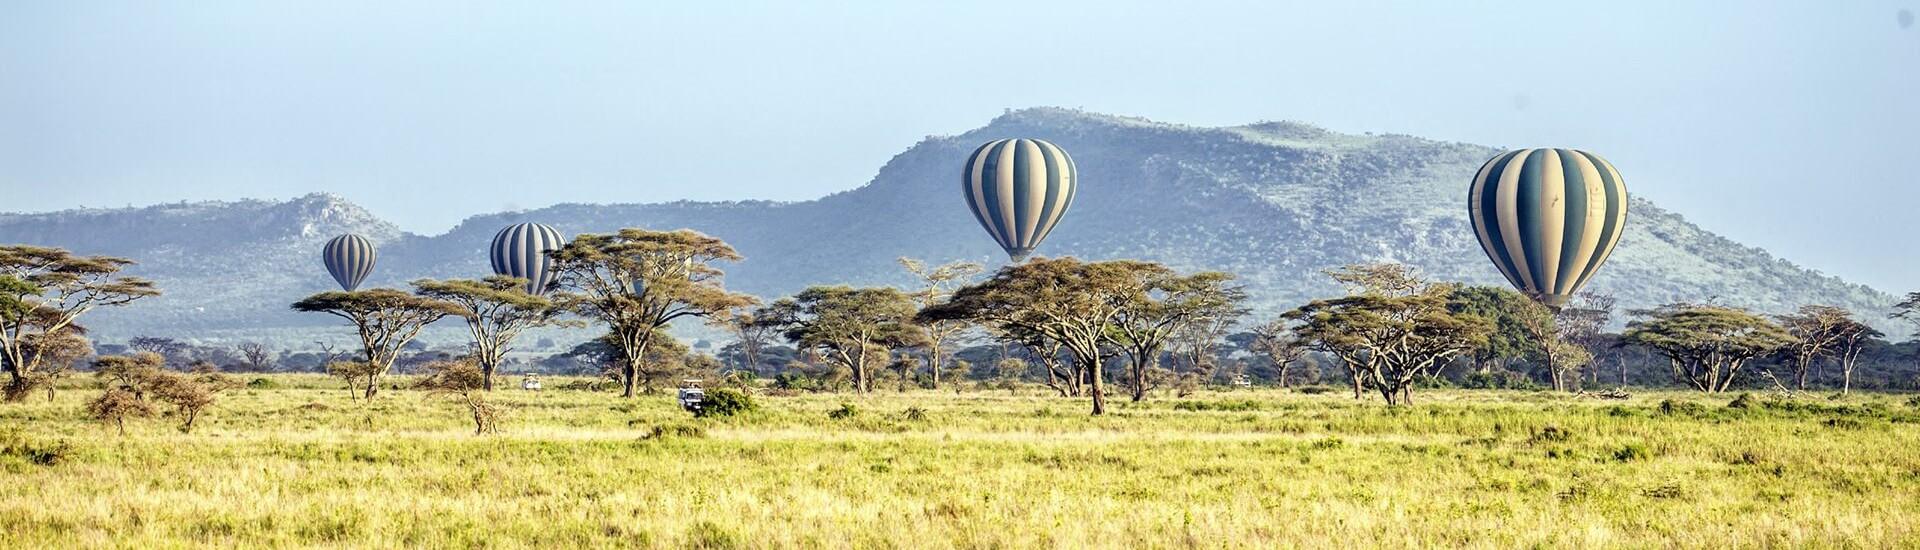 Nyika Discovery - Kilimanjaro climbing